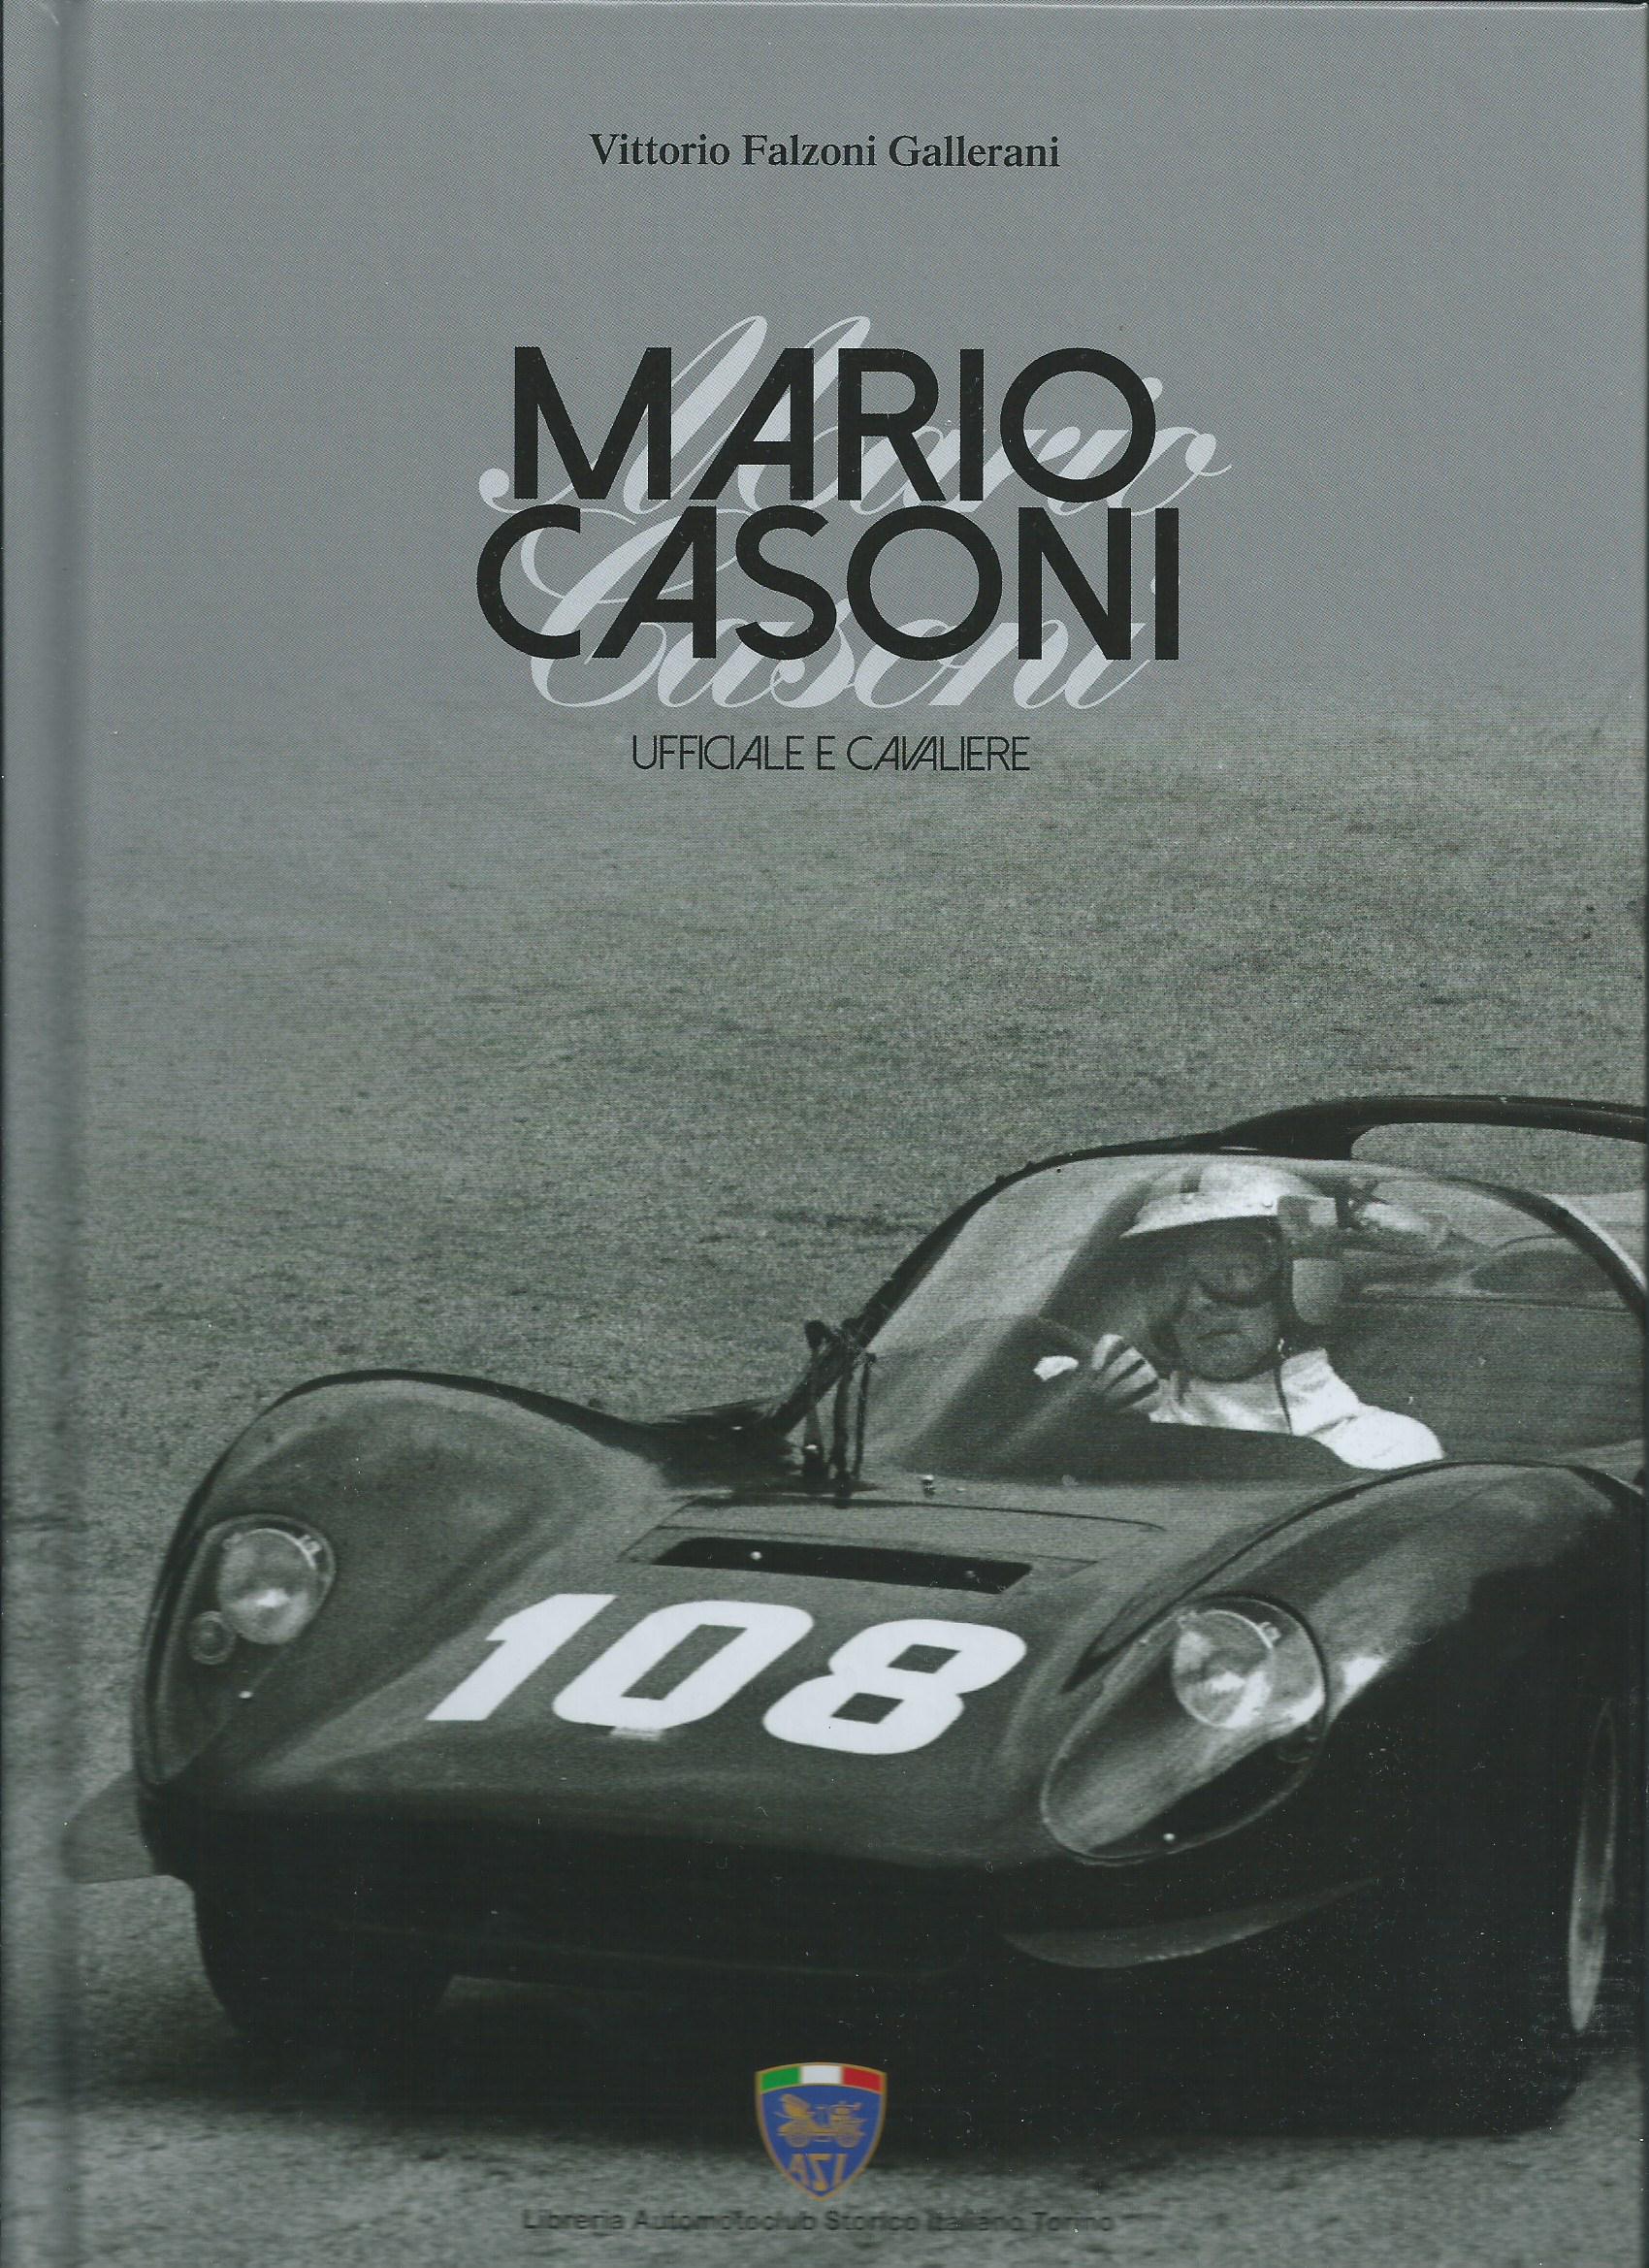 Mario Casoni